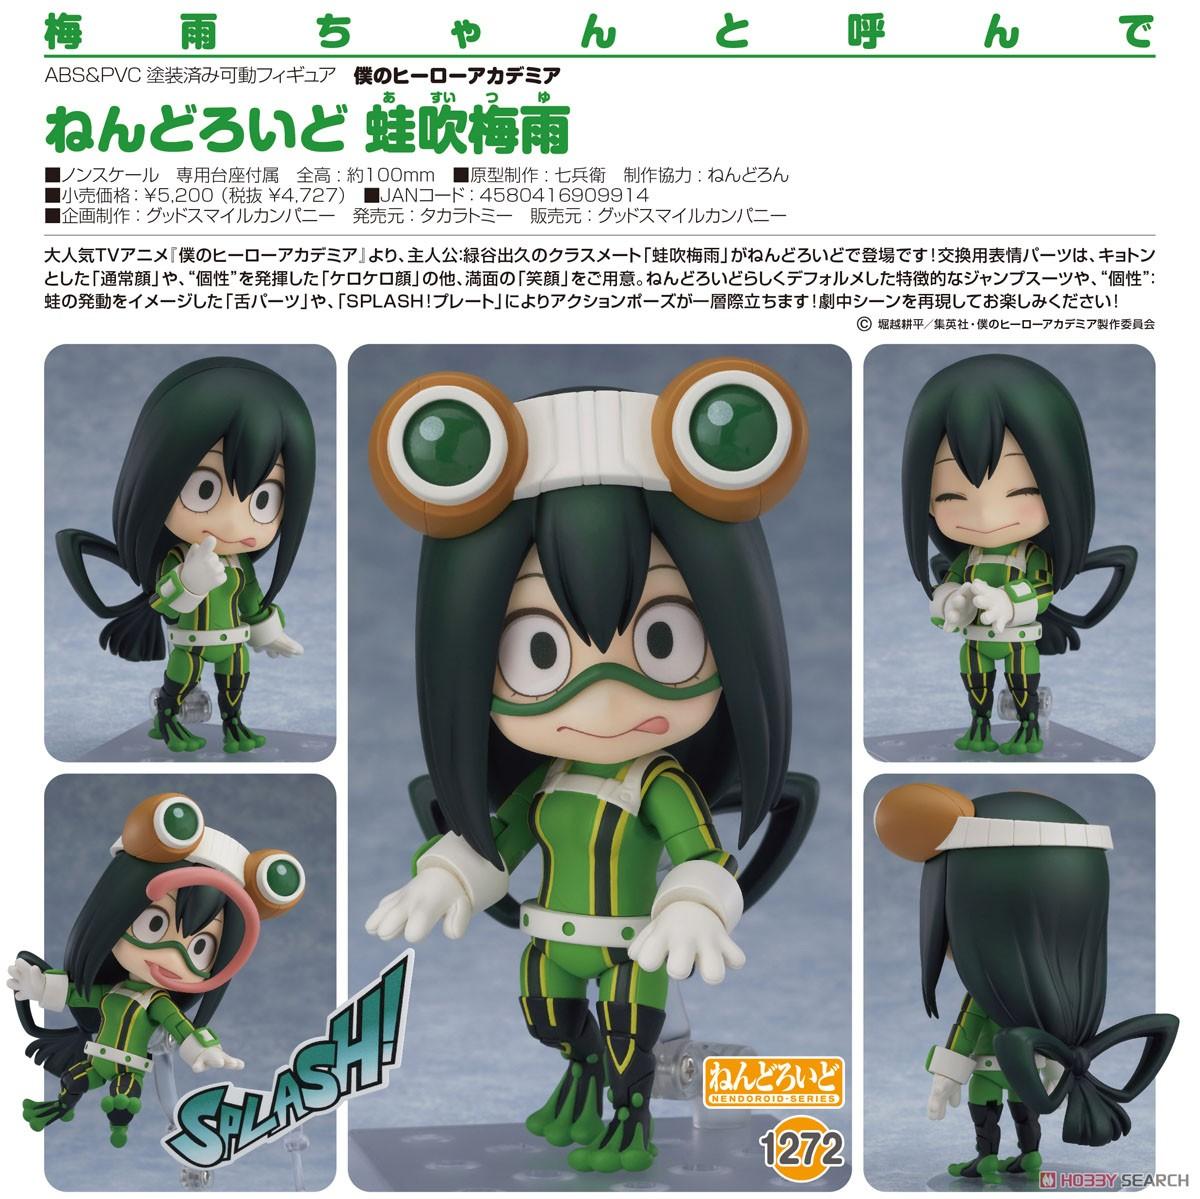 Nendoroid My Hero Academia Tsuyu Asui